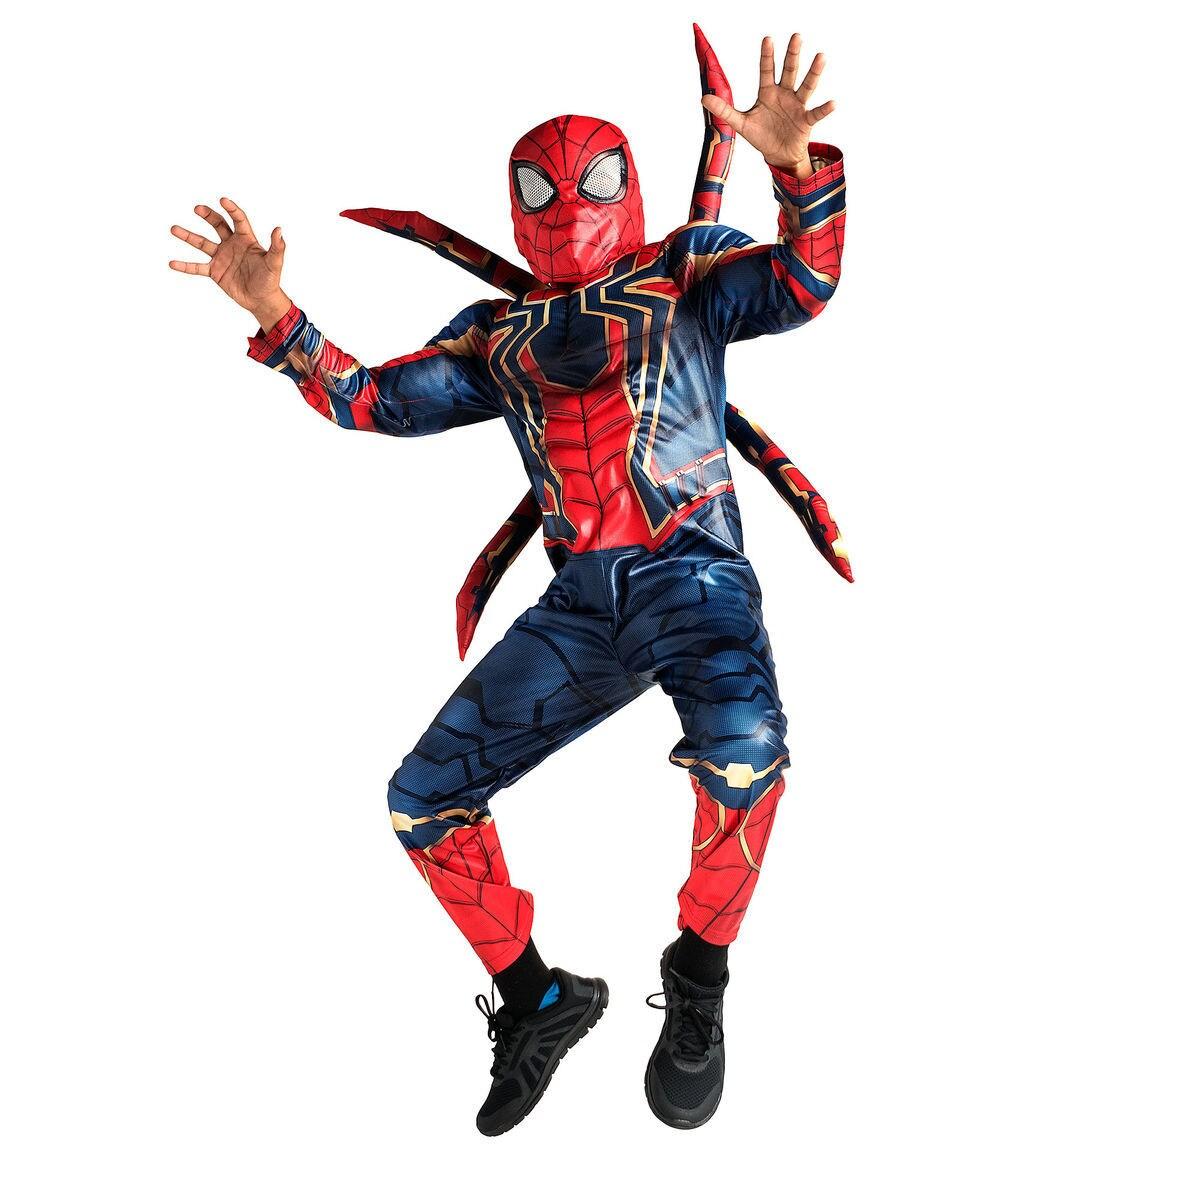 Spider Man Costume Collection For Kids Iron Spider Shopdisney